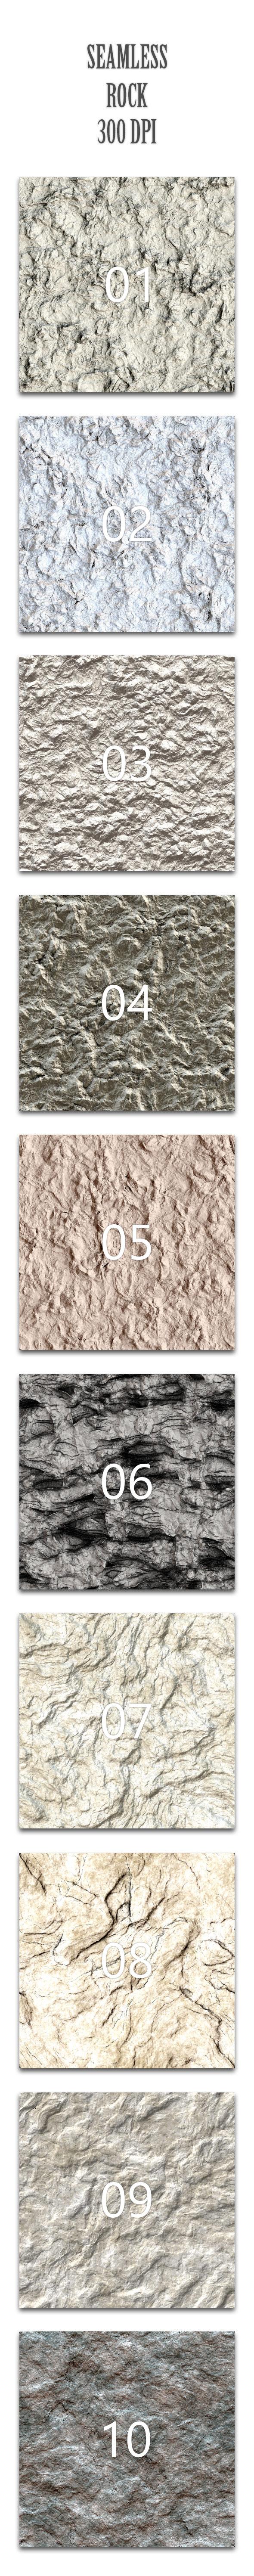 Seamless Rock - Nature Textures / Fills / Patterns